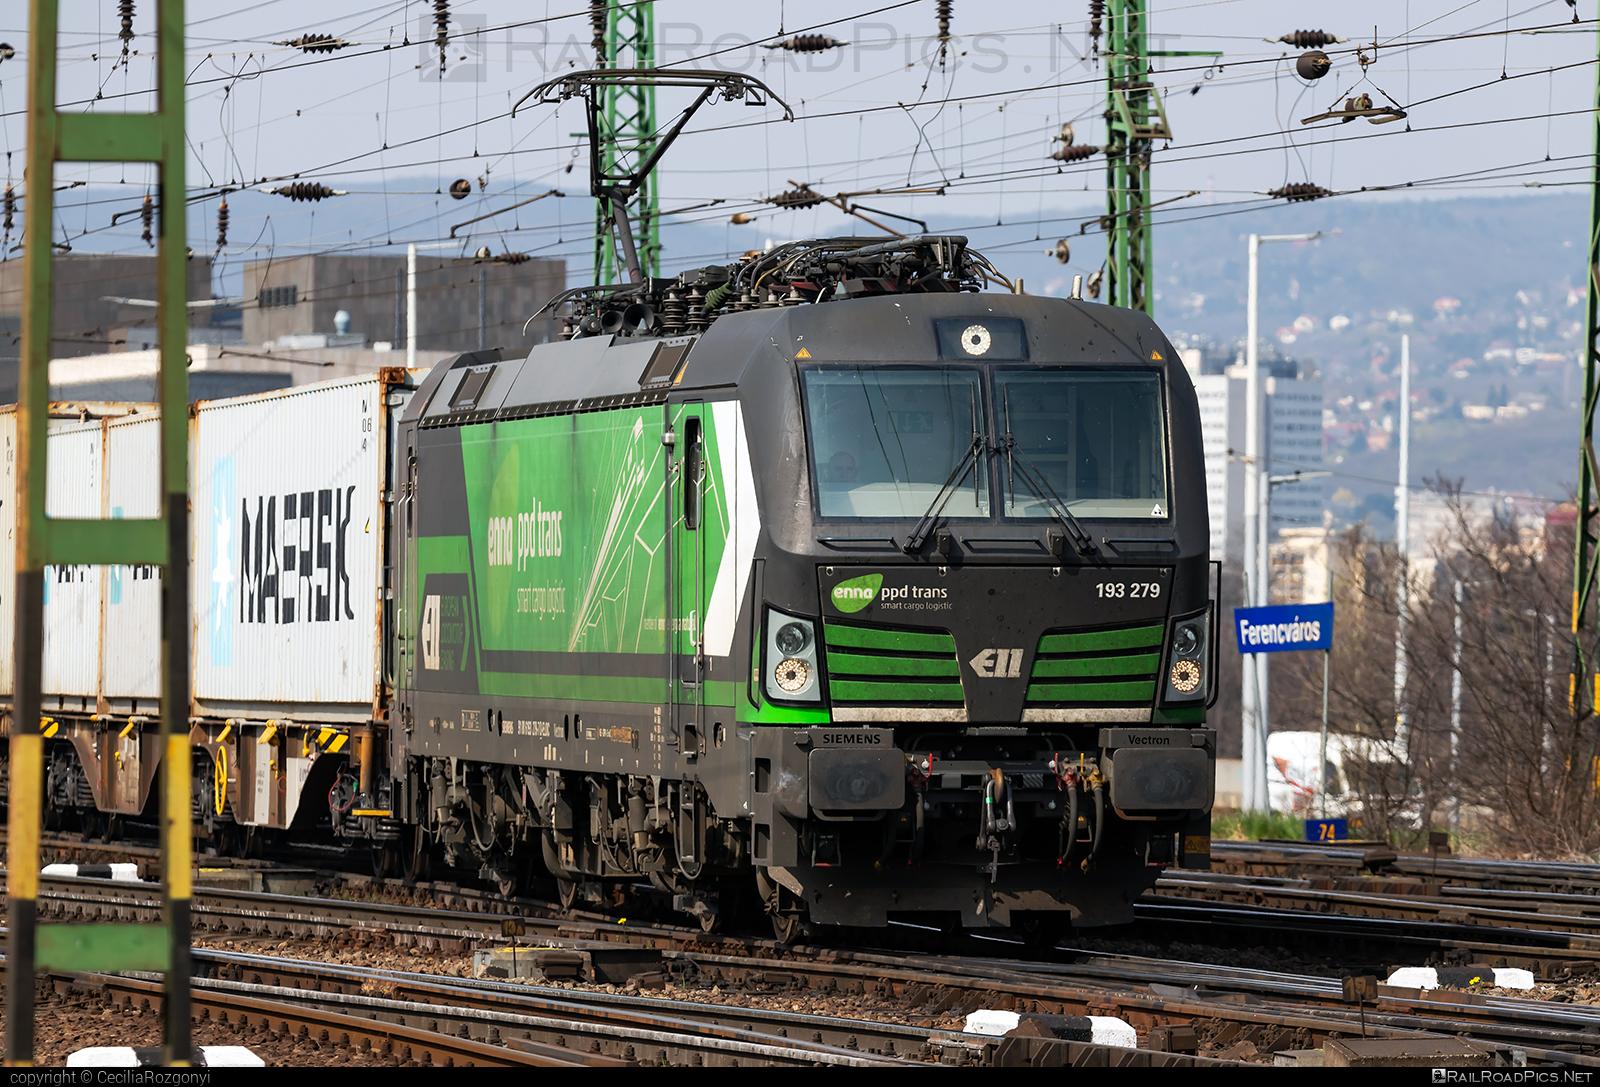 Siemens Vectron MS - 193 279 operated by ENNA TRANSPORT d.o.o. za prijevoz tereta #ell #ellgermany #eloc #enna #europeanlocomotiveleasing #flatwagon #siemens #siemensvectron #siemensvectronms #vectron #vectronms